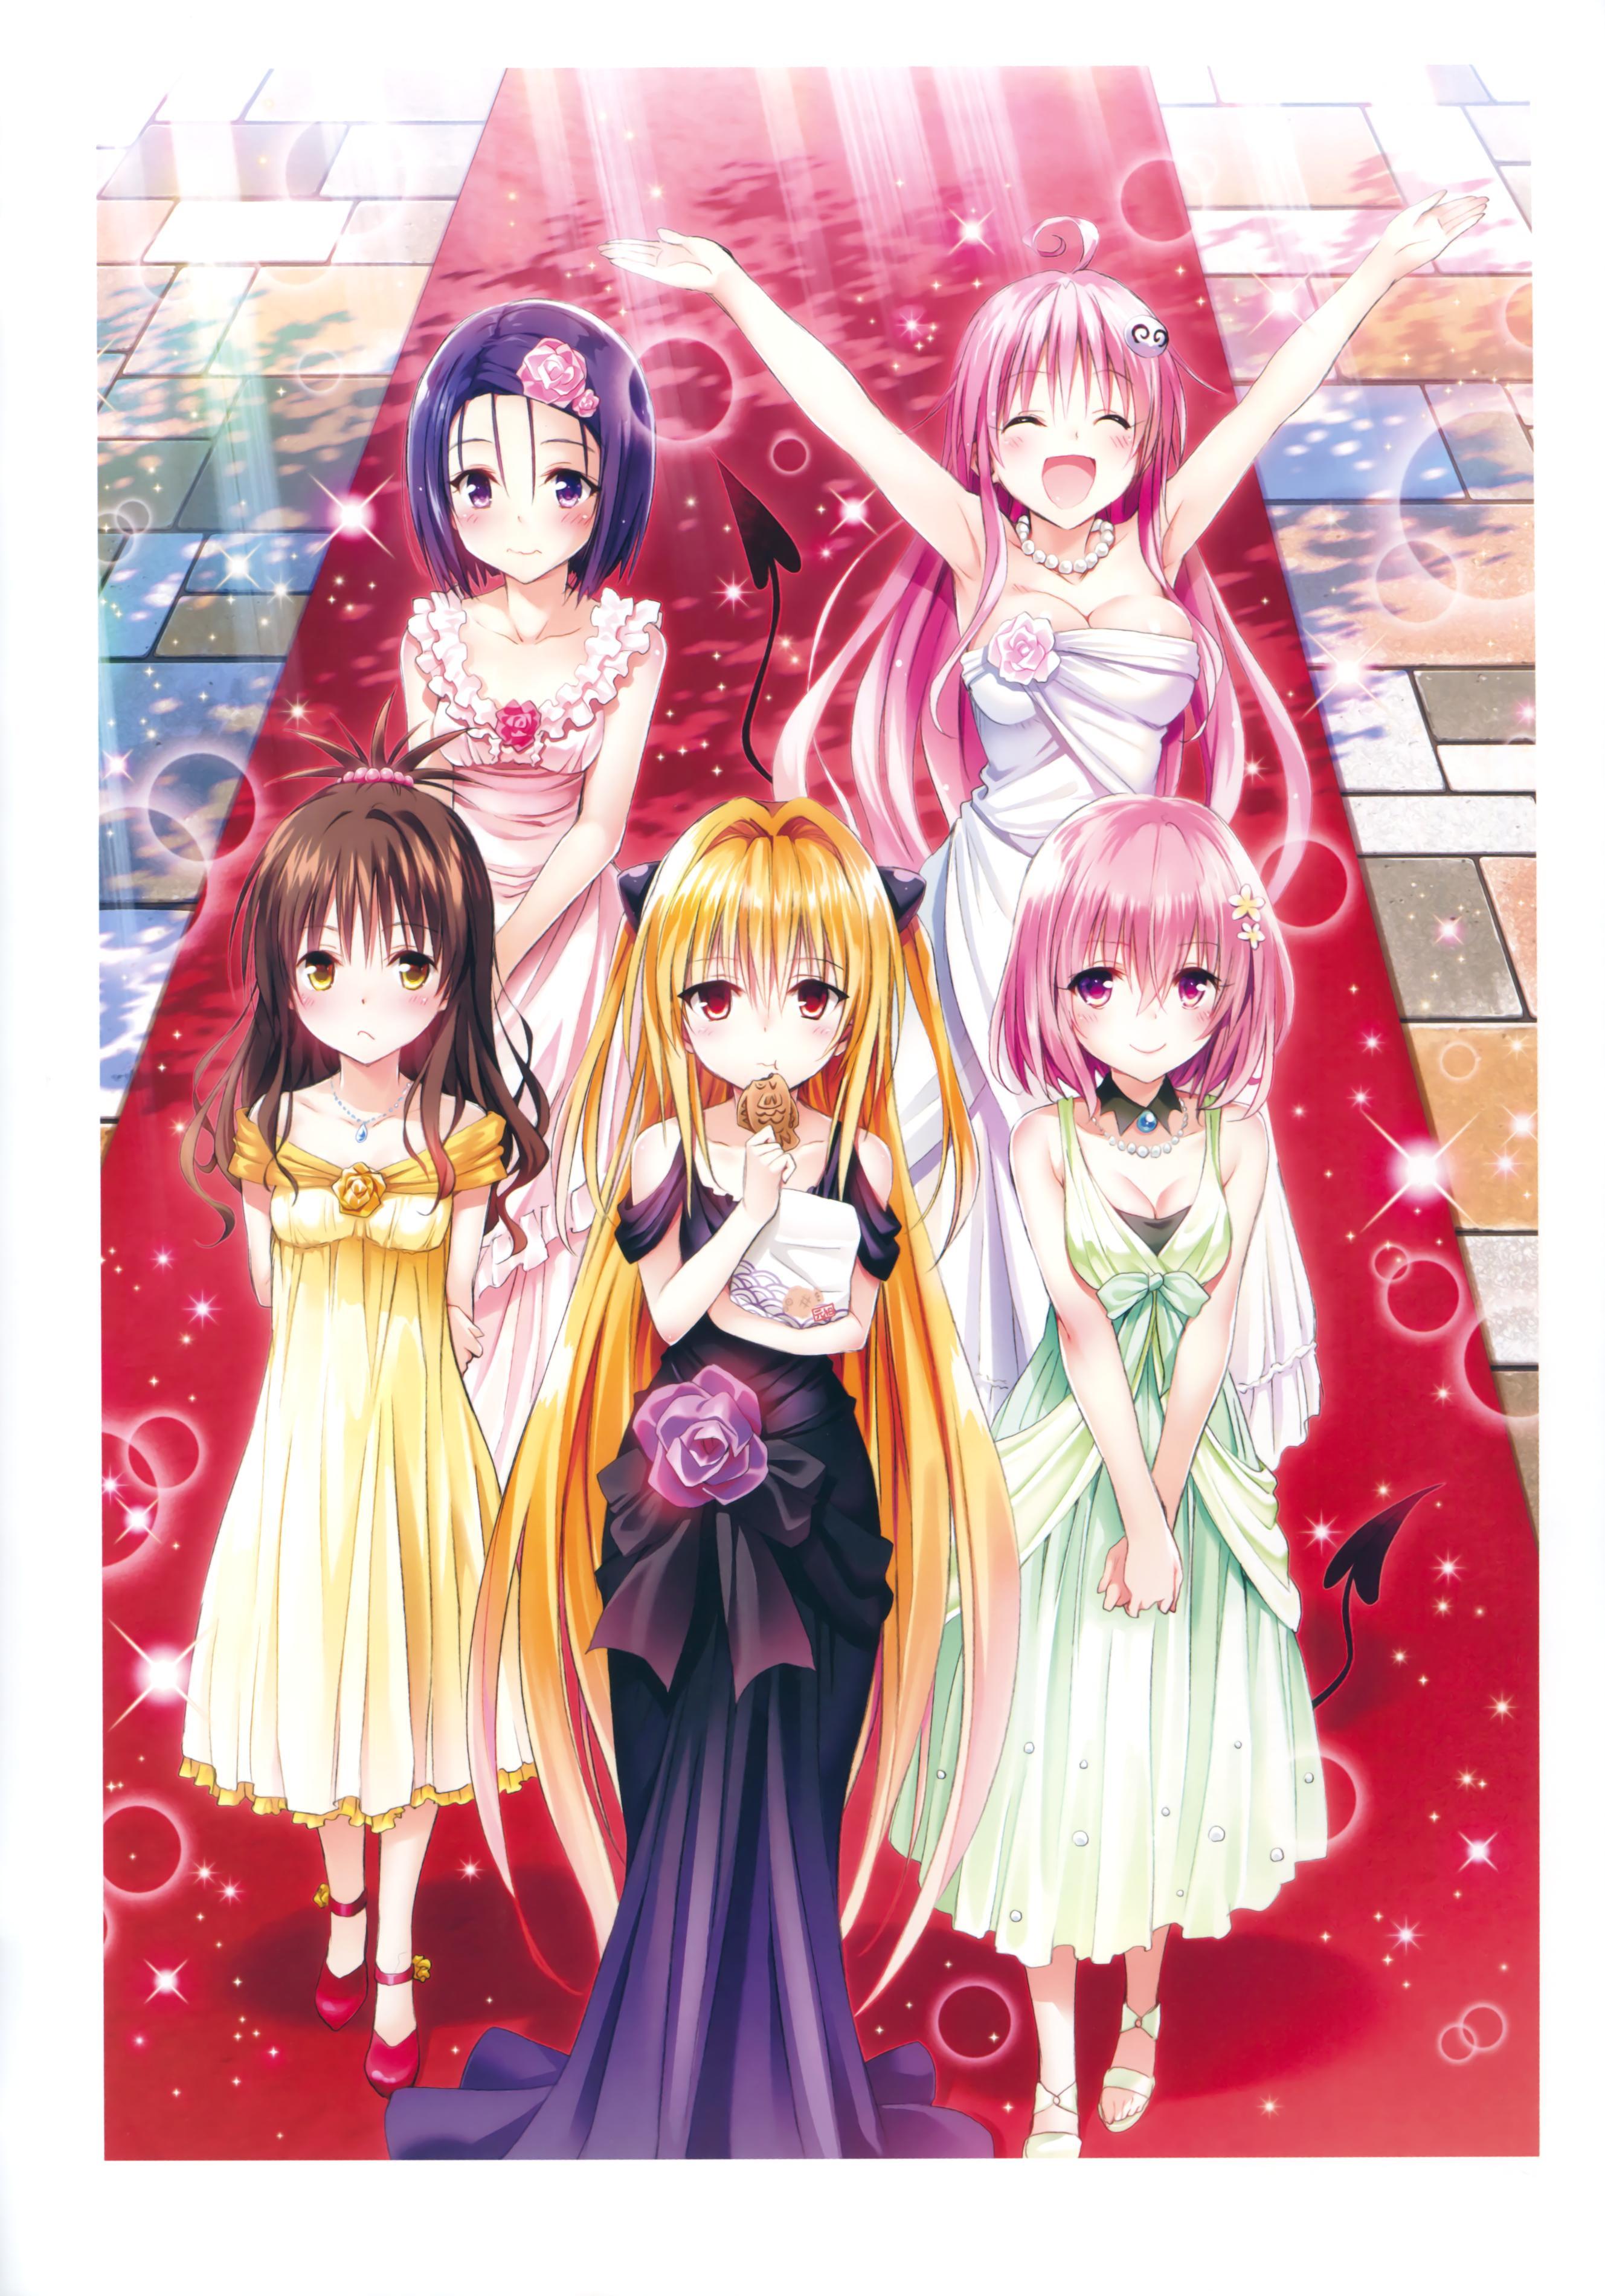 [Yabuki Kentaro] To Love-Ru -Trouble- Darkness Artbook Harem Gold 67